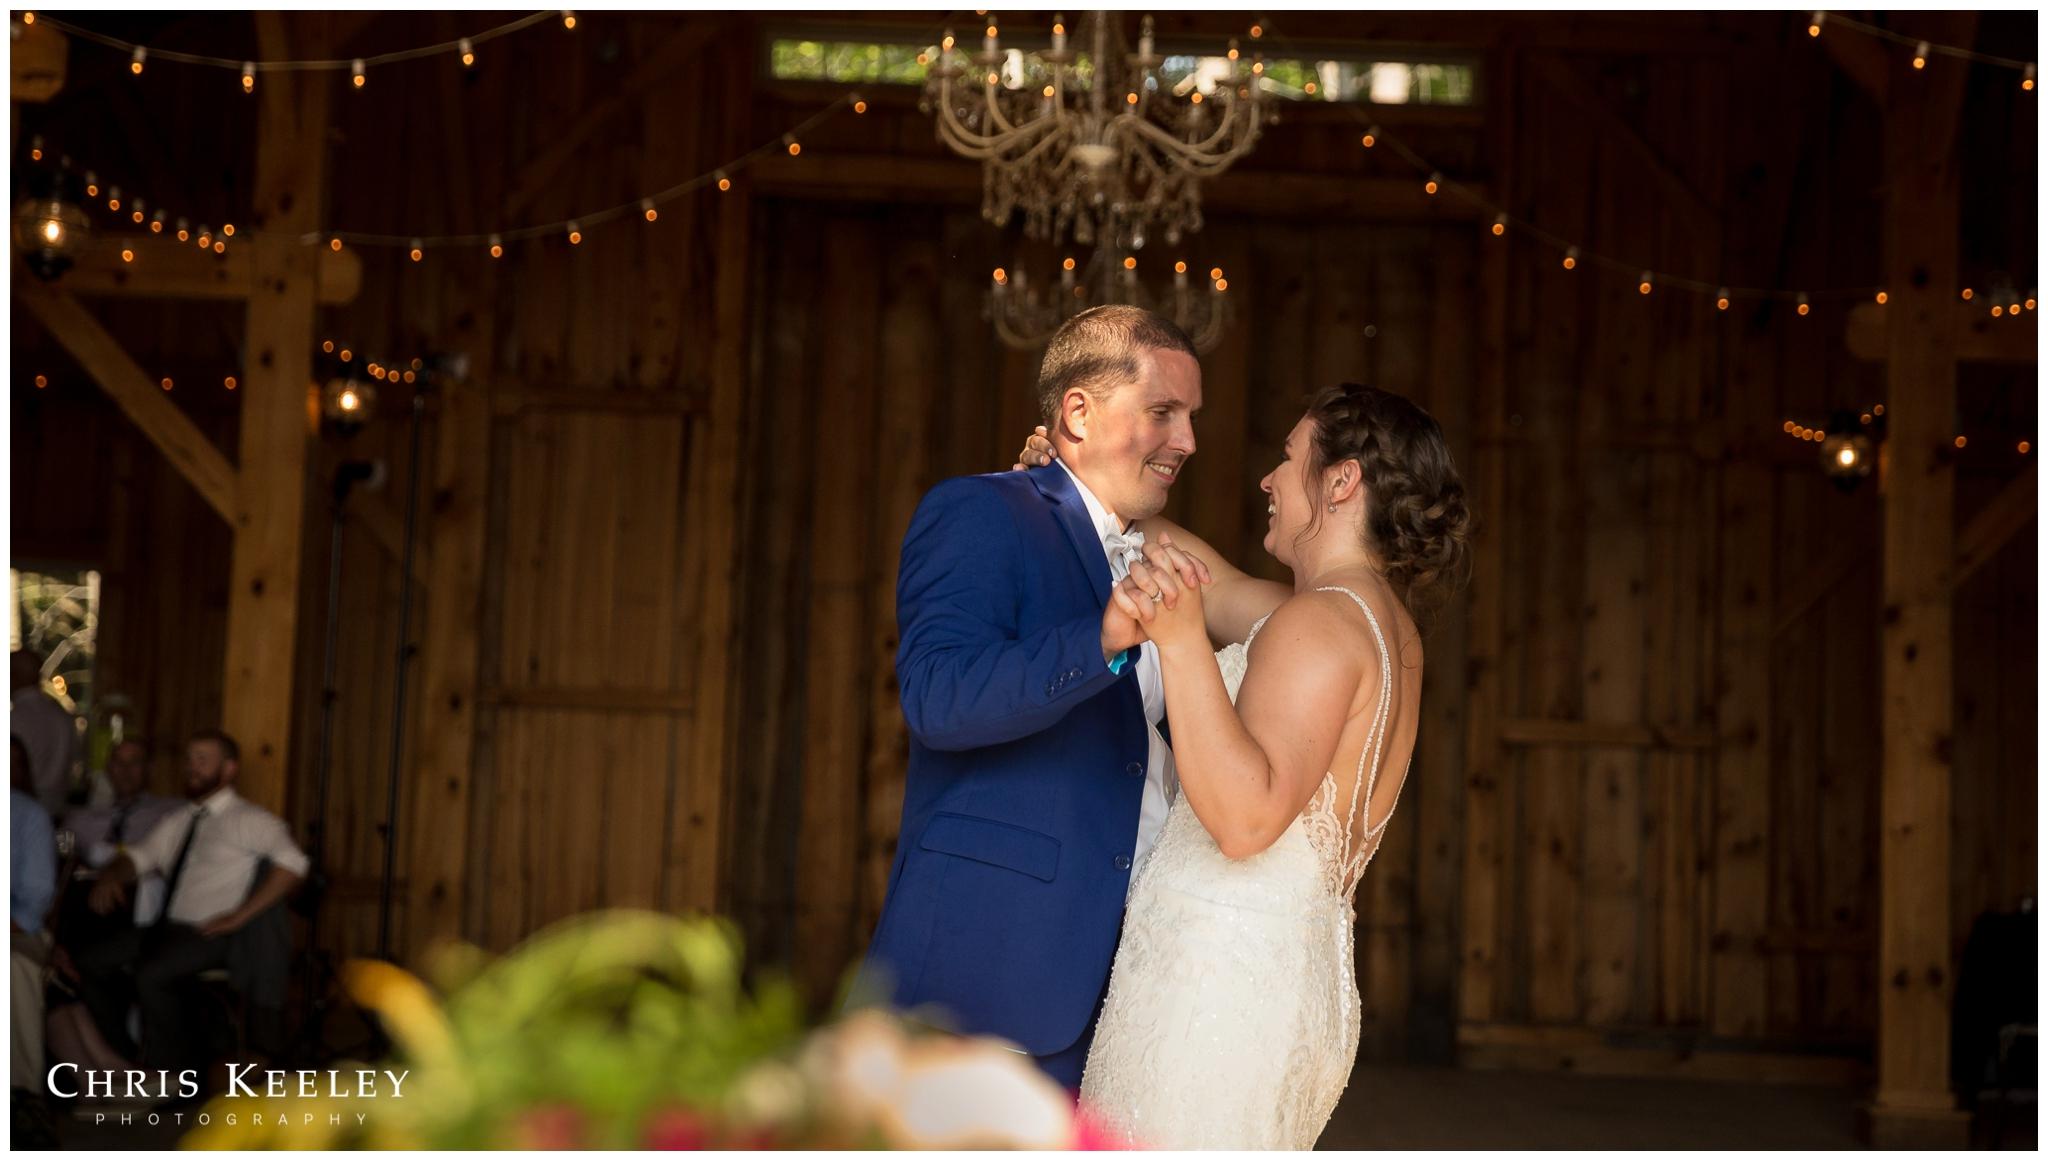 bride-groom-smiling-during-first-dance.jpg